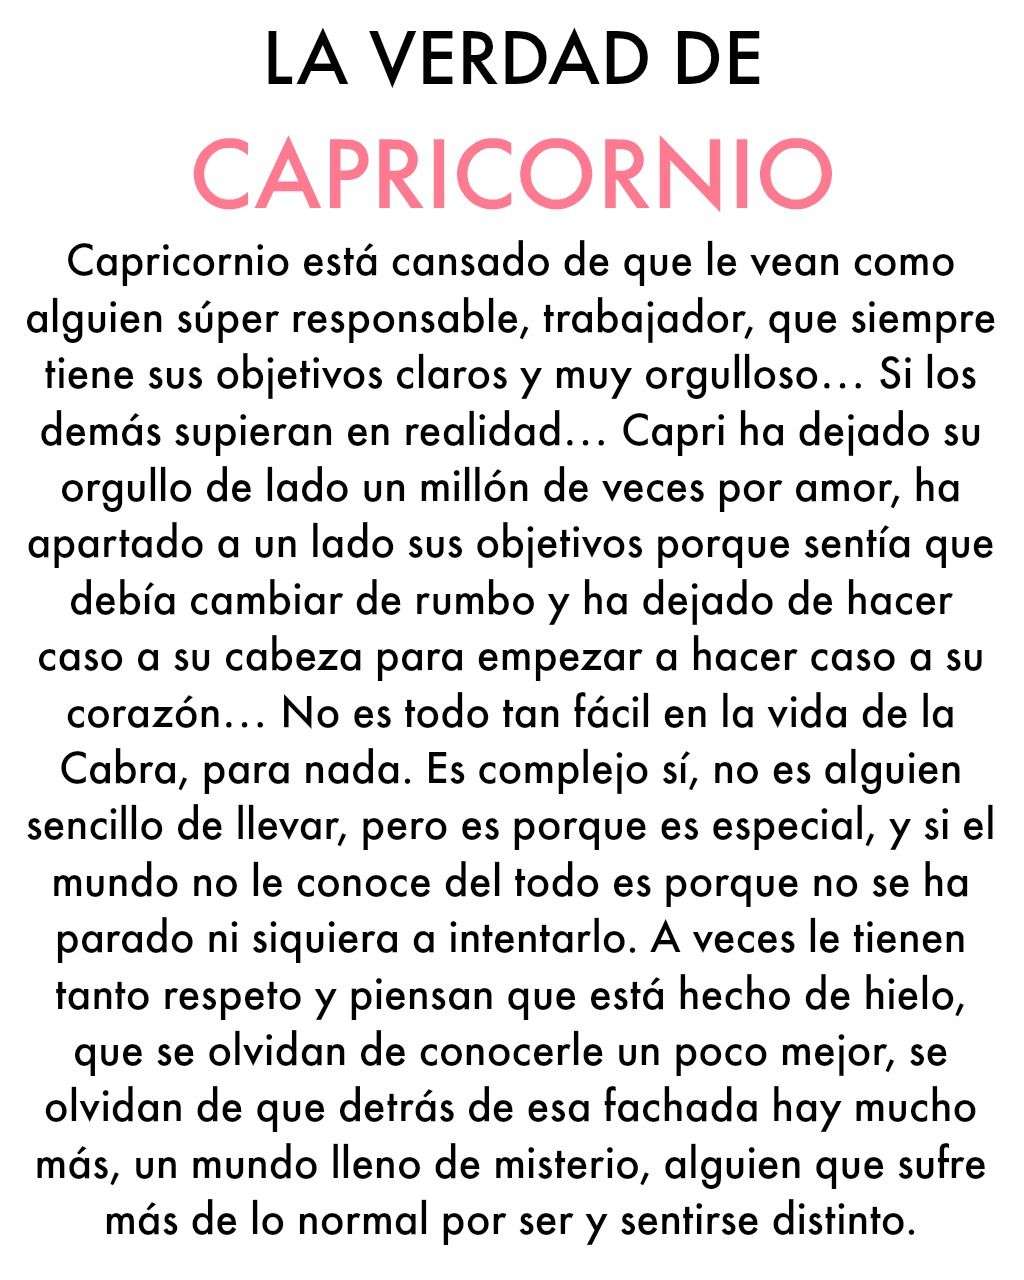 La Verdad De Capricornio Frases Capricorn Zodiac Y Astrology